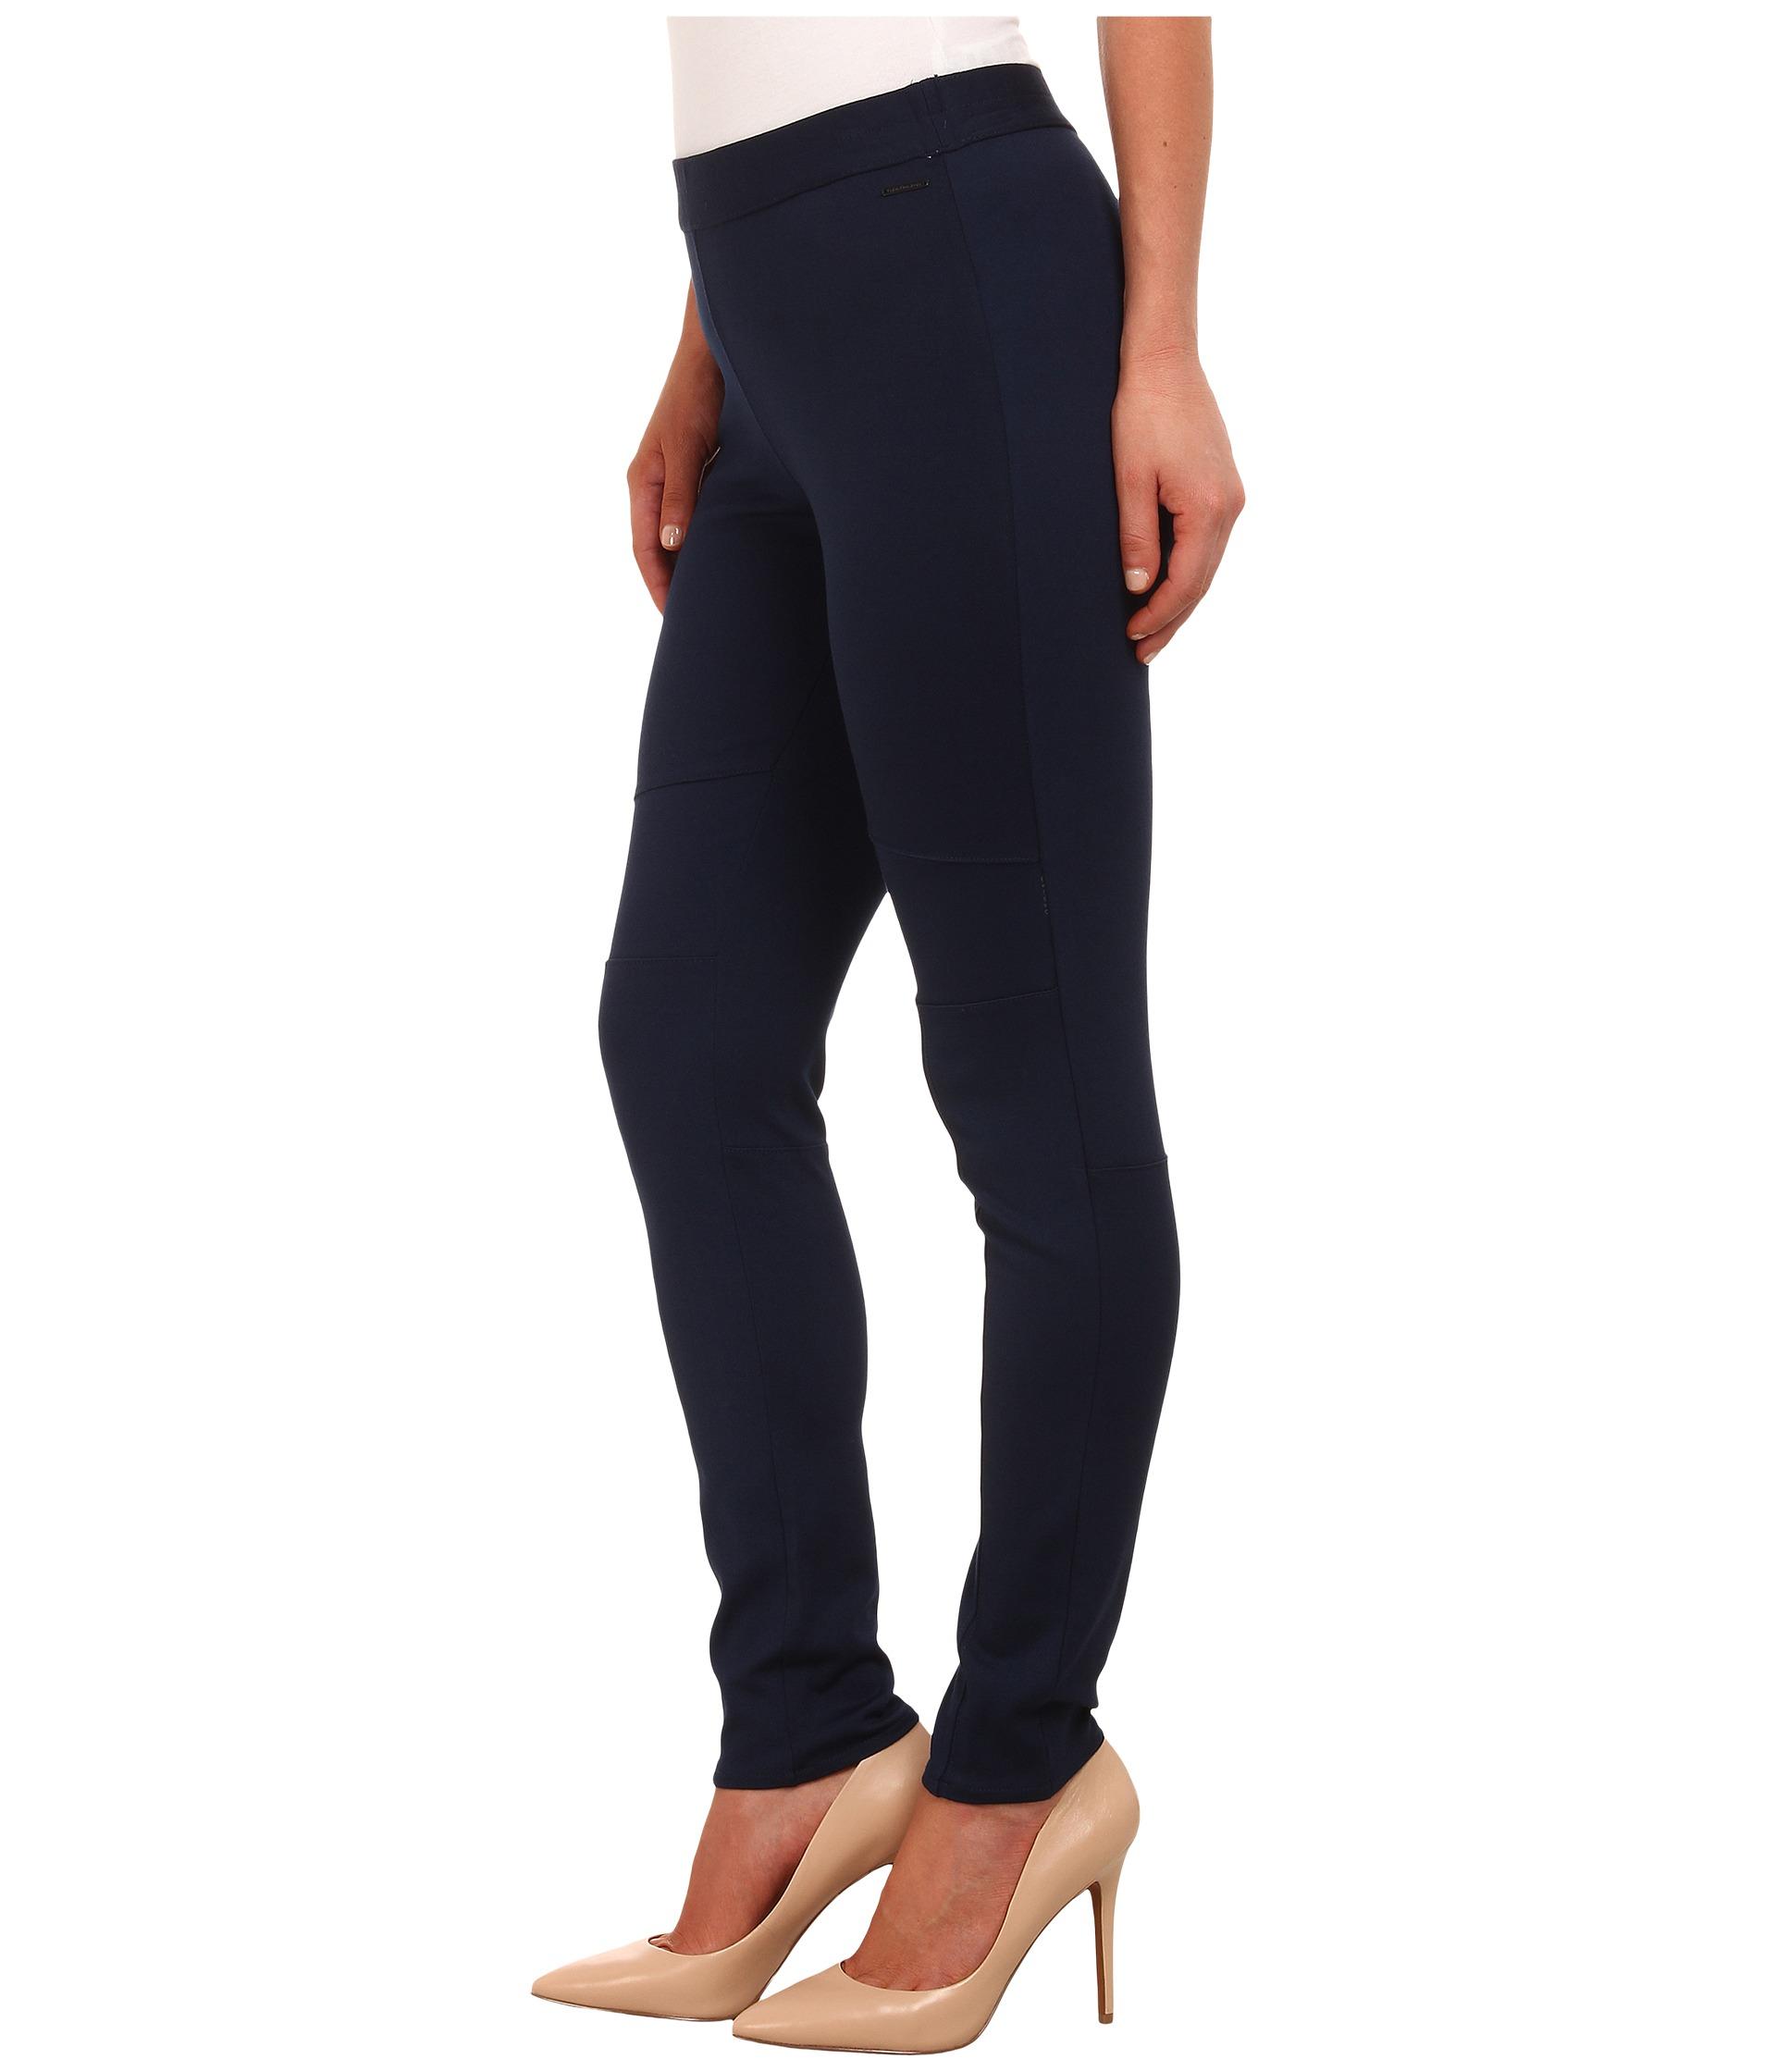 calvin klein jeans pull on ponte leggings. Black Bedroom Furniture Sets. Home Design Ideas